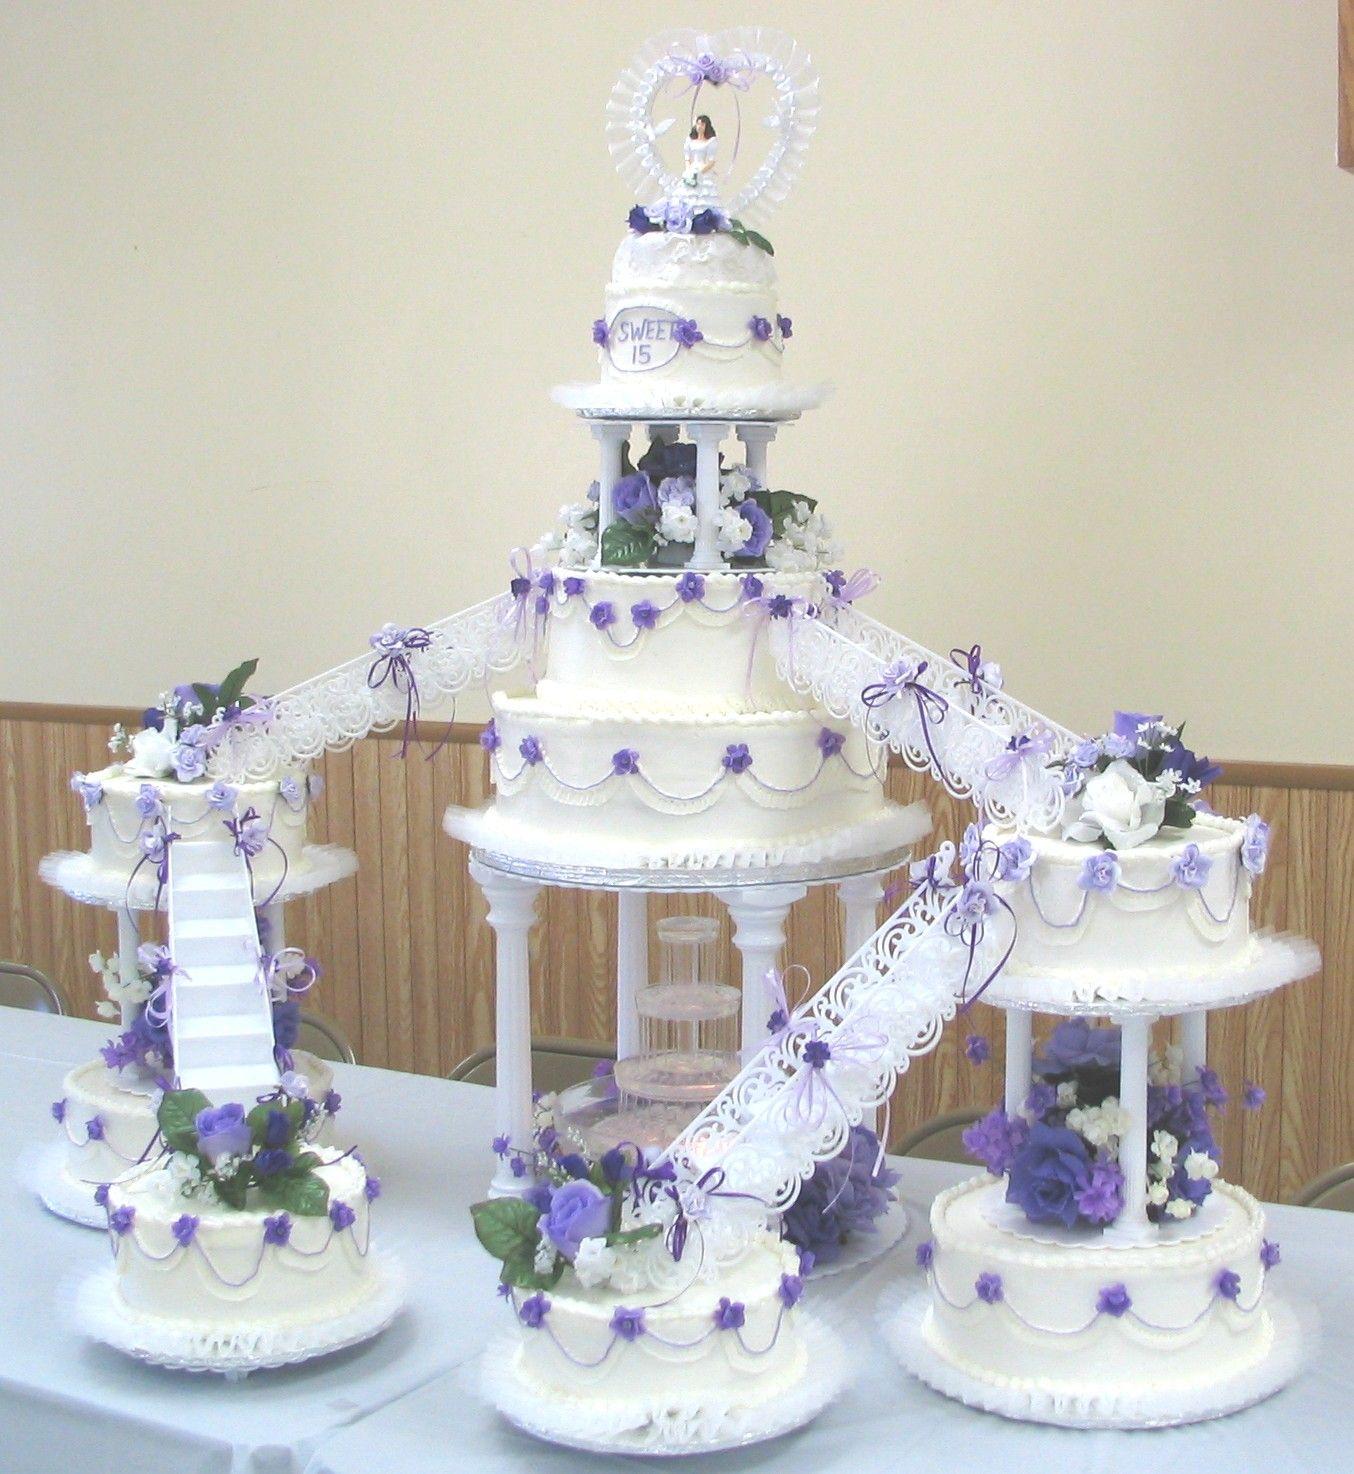 wedding cake creations gallery 1 Quinceanera cakes